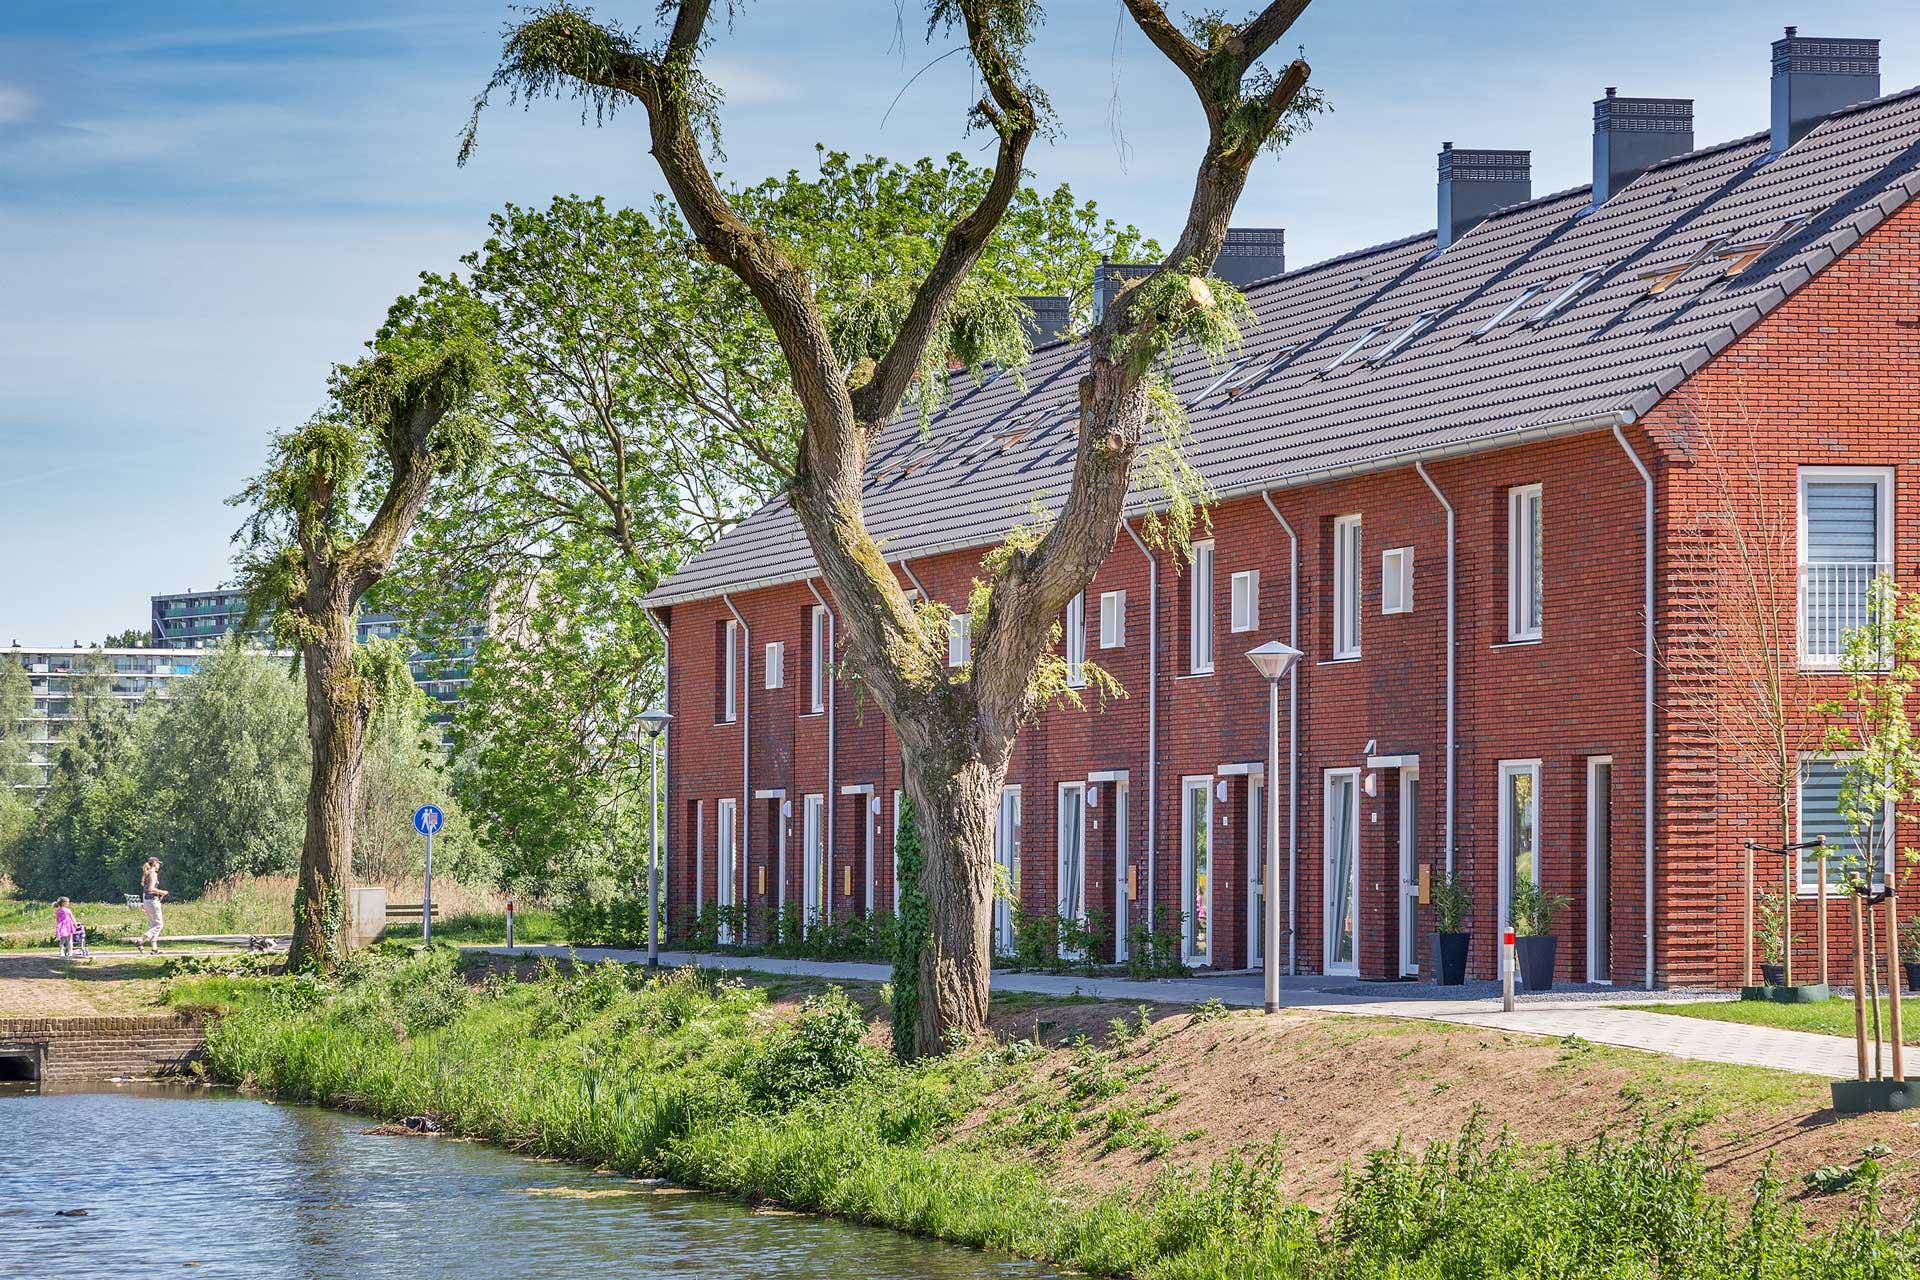 Arnhem - Malburgen 2